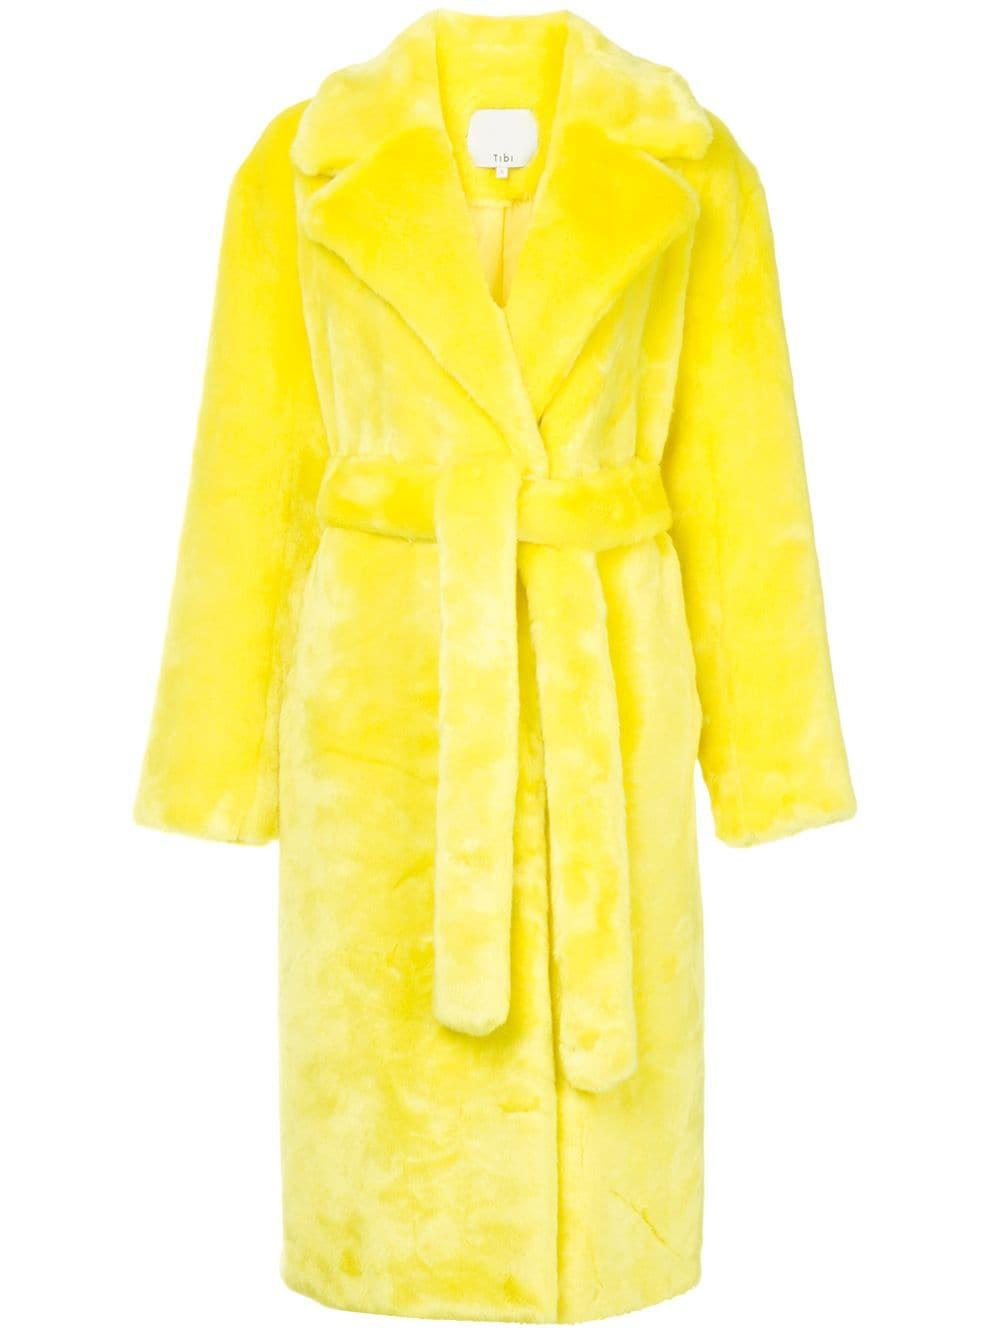 26ef9504e159 Tibi Luxe Faux Fur Oversized Coat - Yellow   Orange